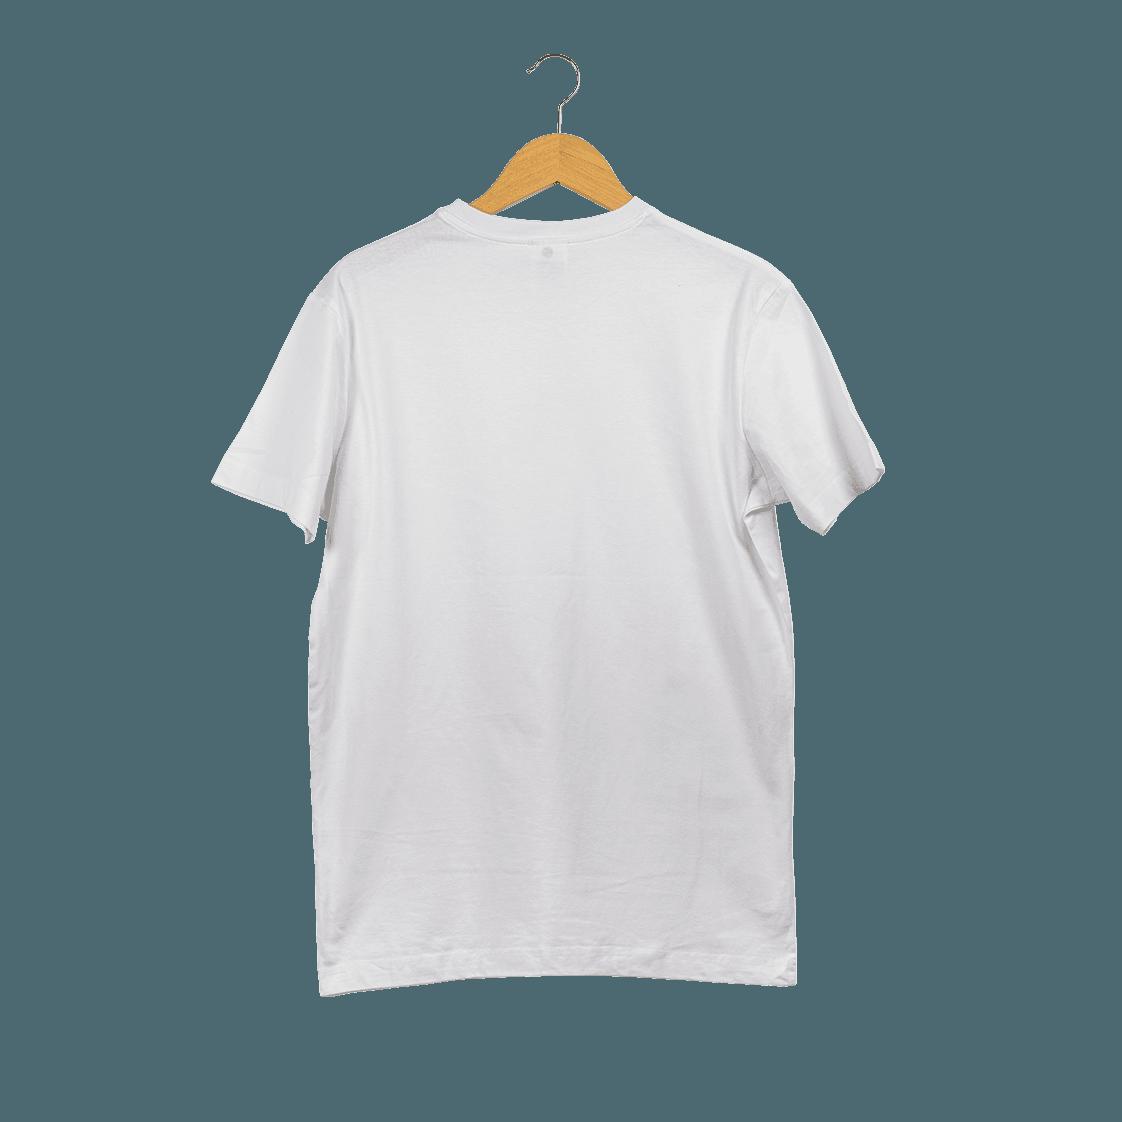 Férfi v-nyakú póló